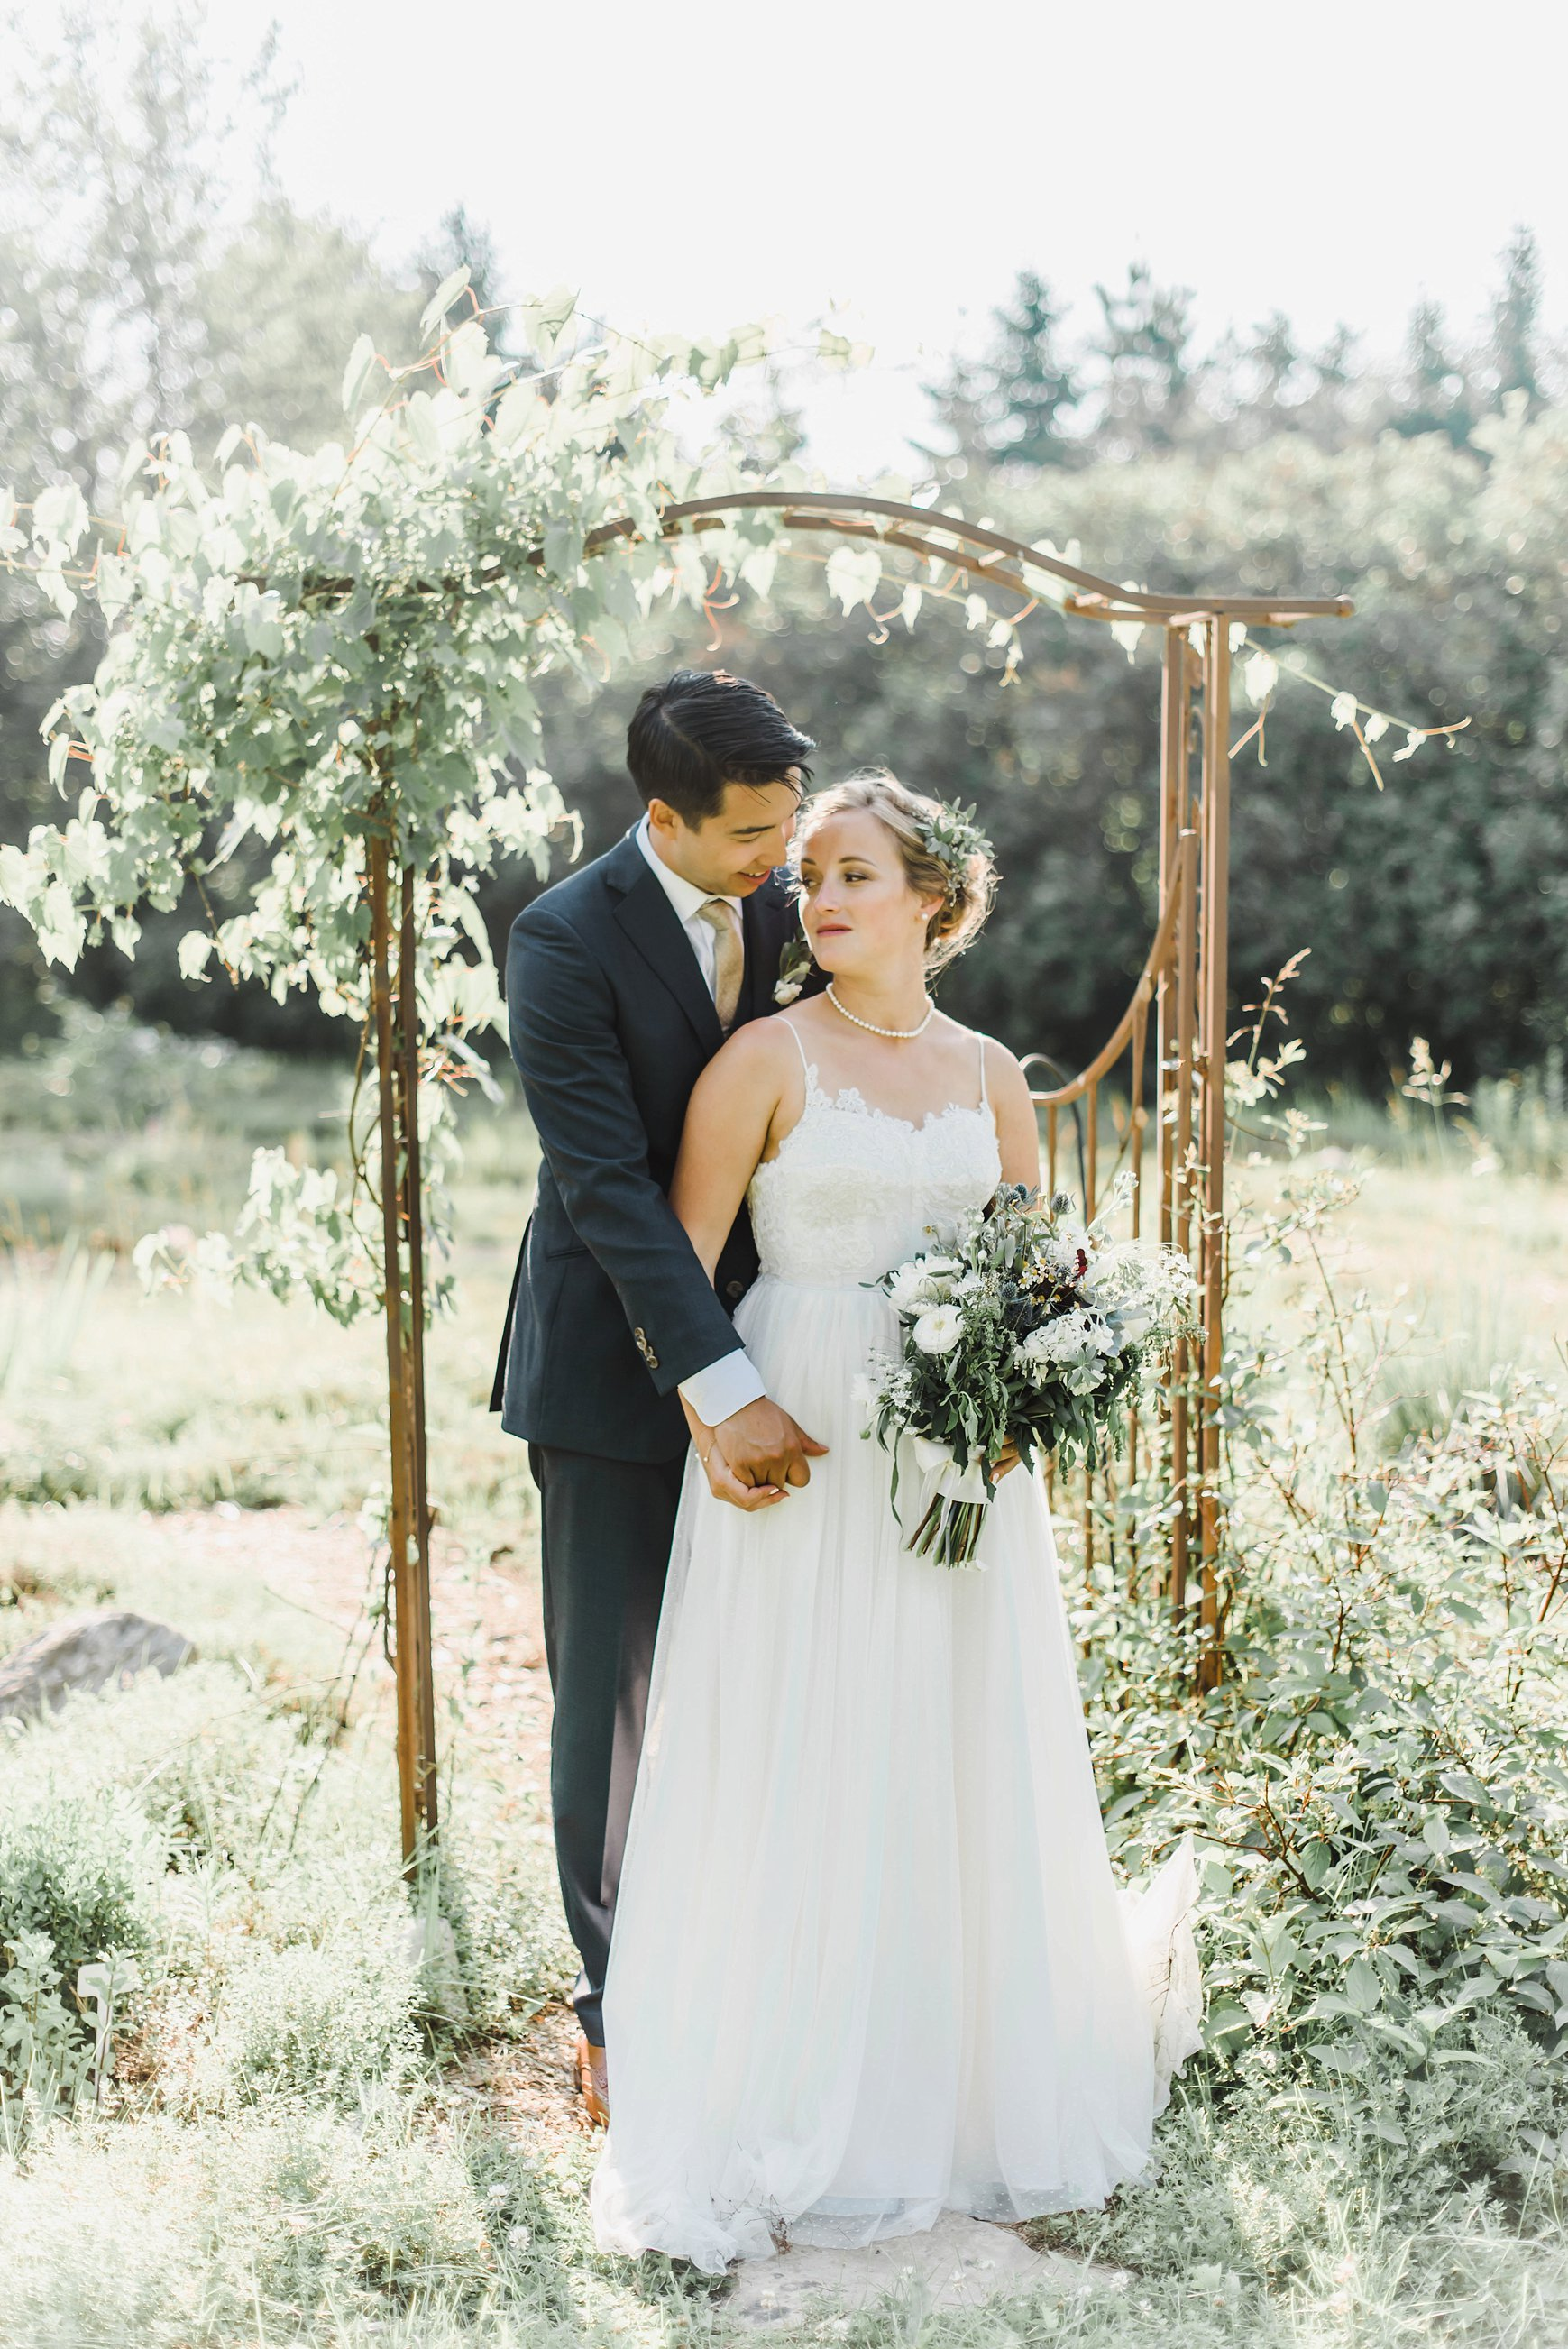 light airy indie fine art ottawa wedding photographer | Ali and Batoul Photography_0845.jpg